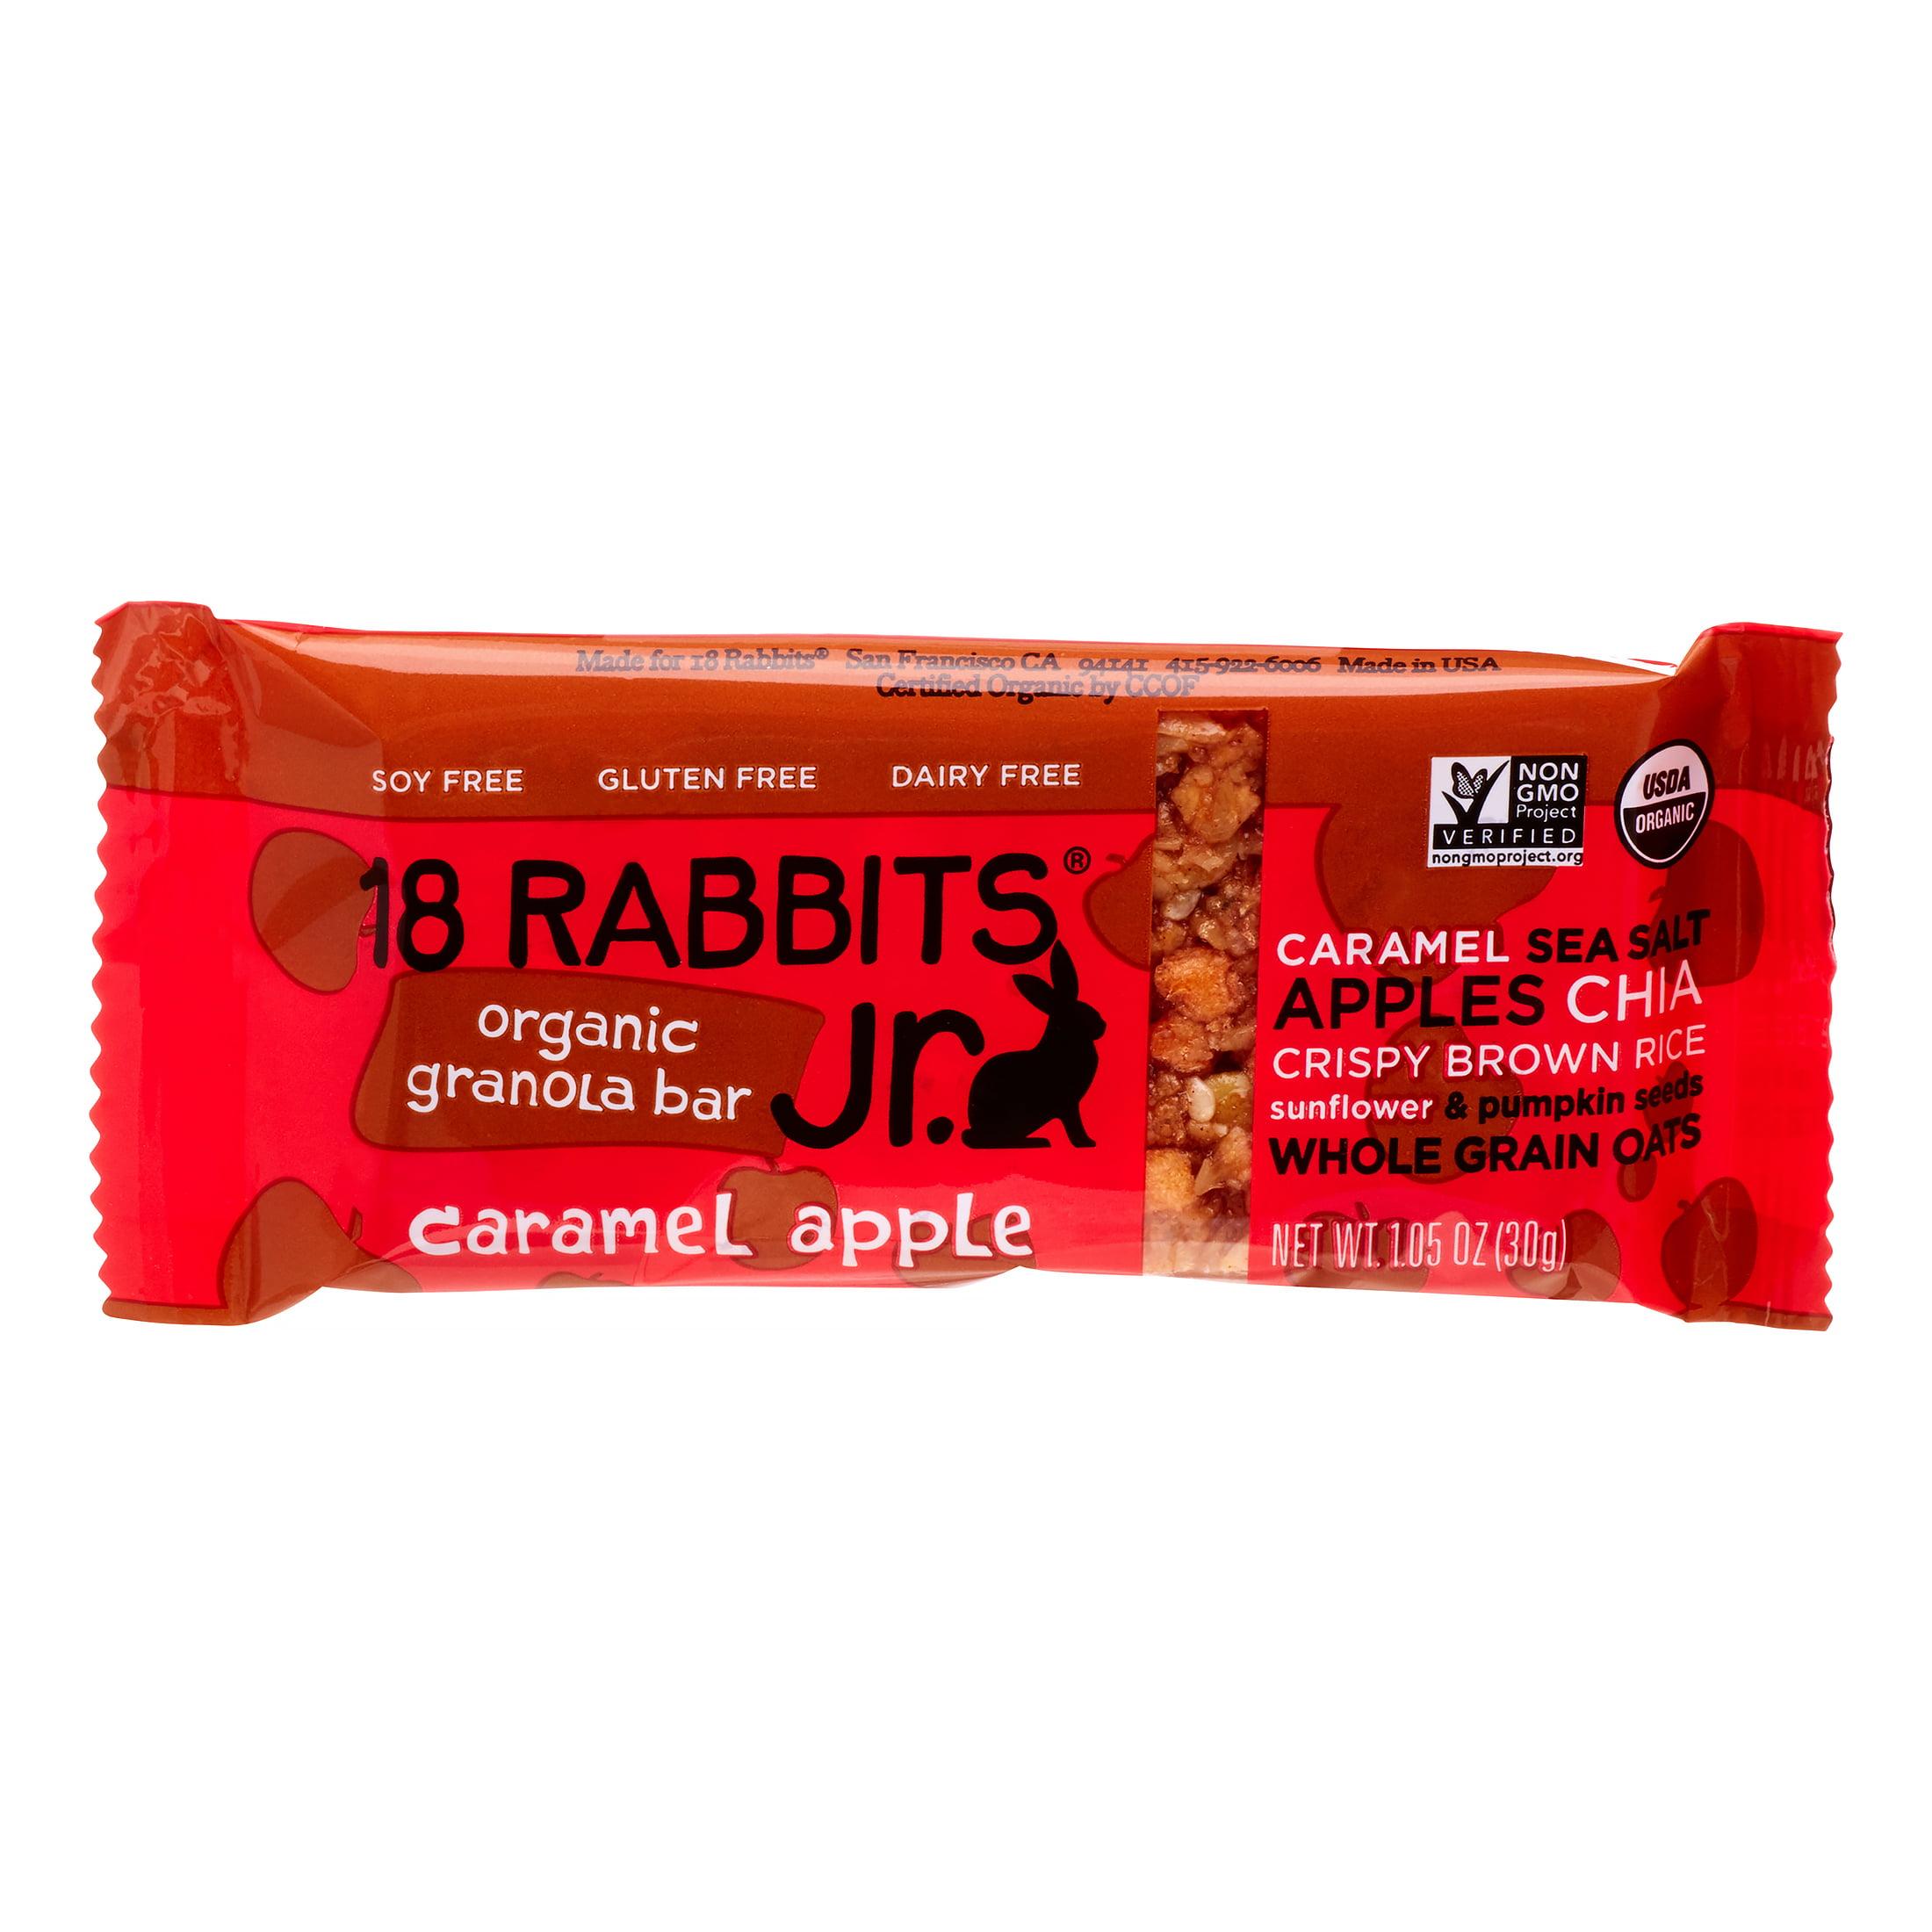 Image of 18 Rabbits Caramel Apple Jr. Organic Granola Bar, 1.05 Oz (Innerpack of 16)